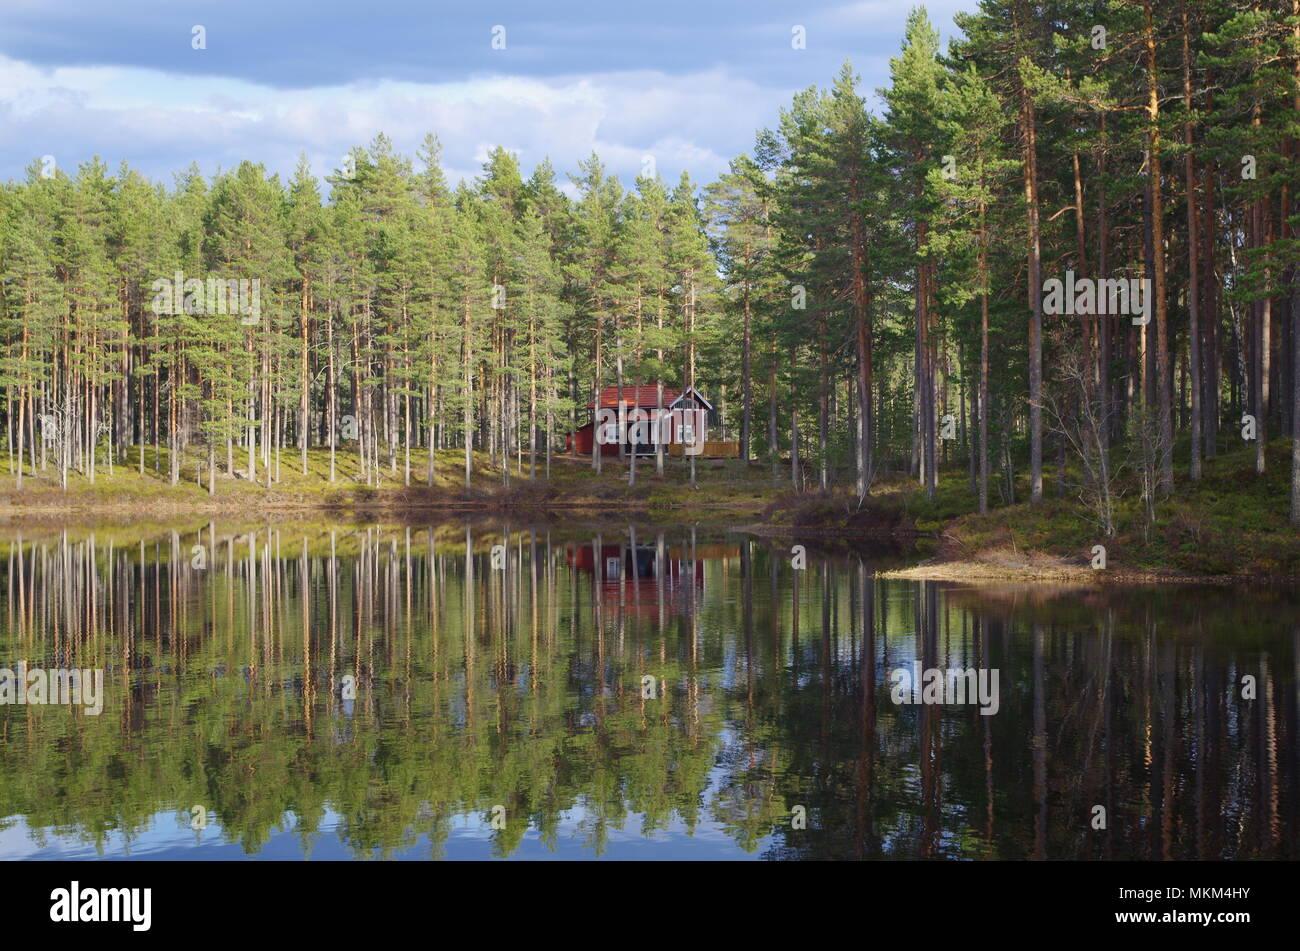 Summer house on a beautiful lake in Dalarna - Stock Image